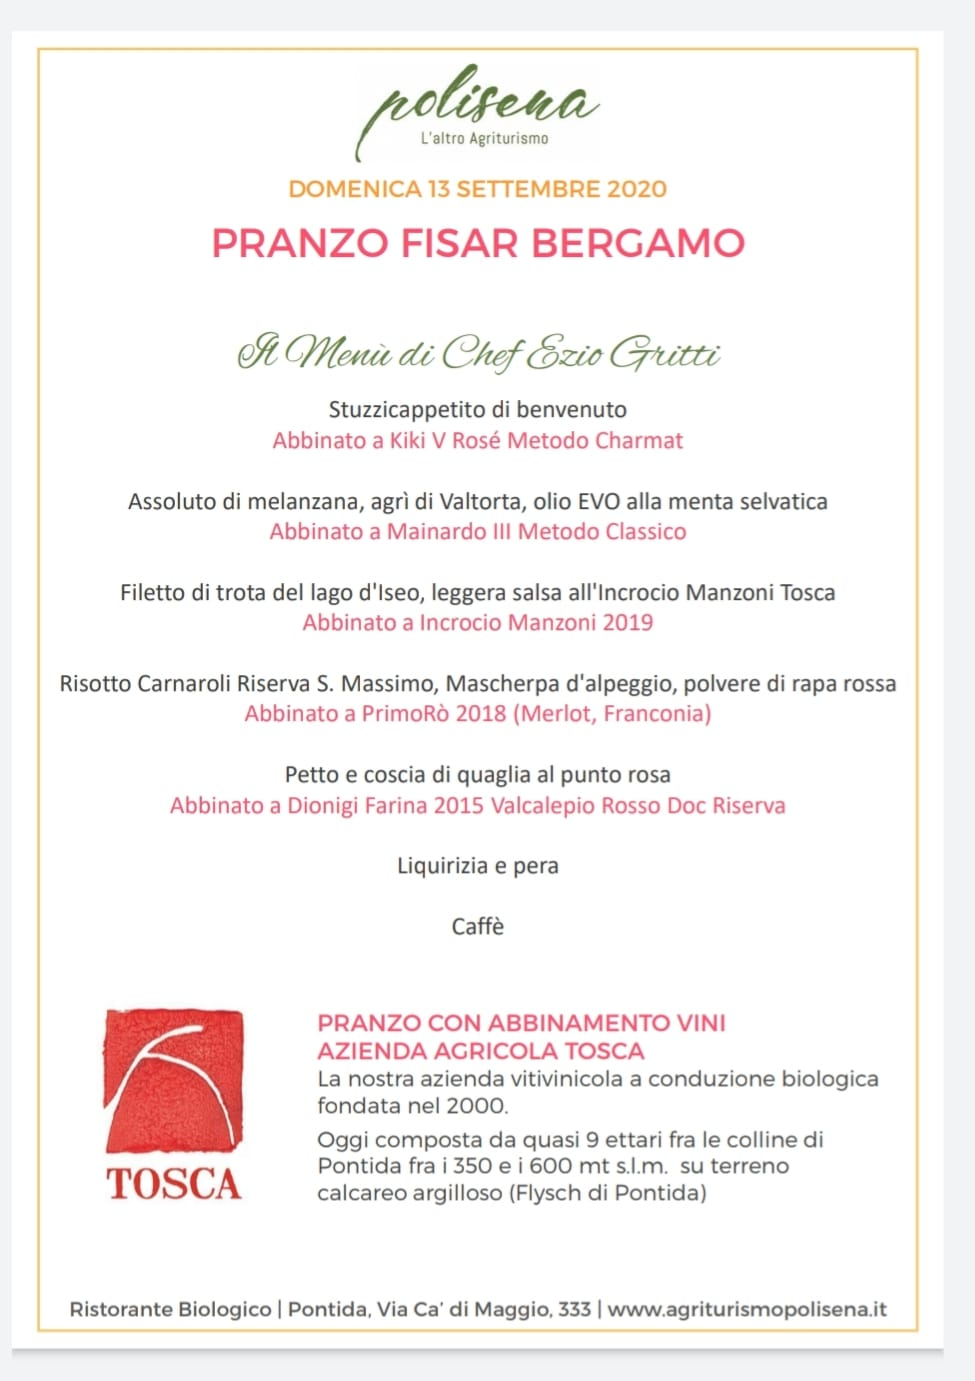 FISAR Pranzo Fisar Bergamo